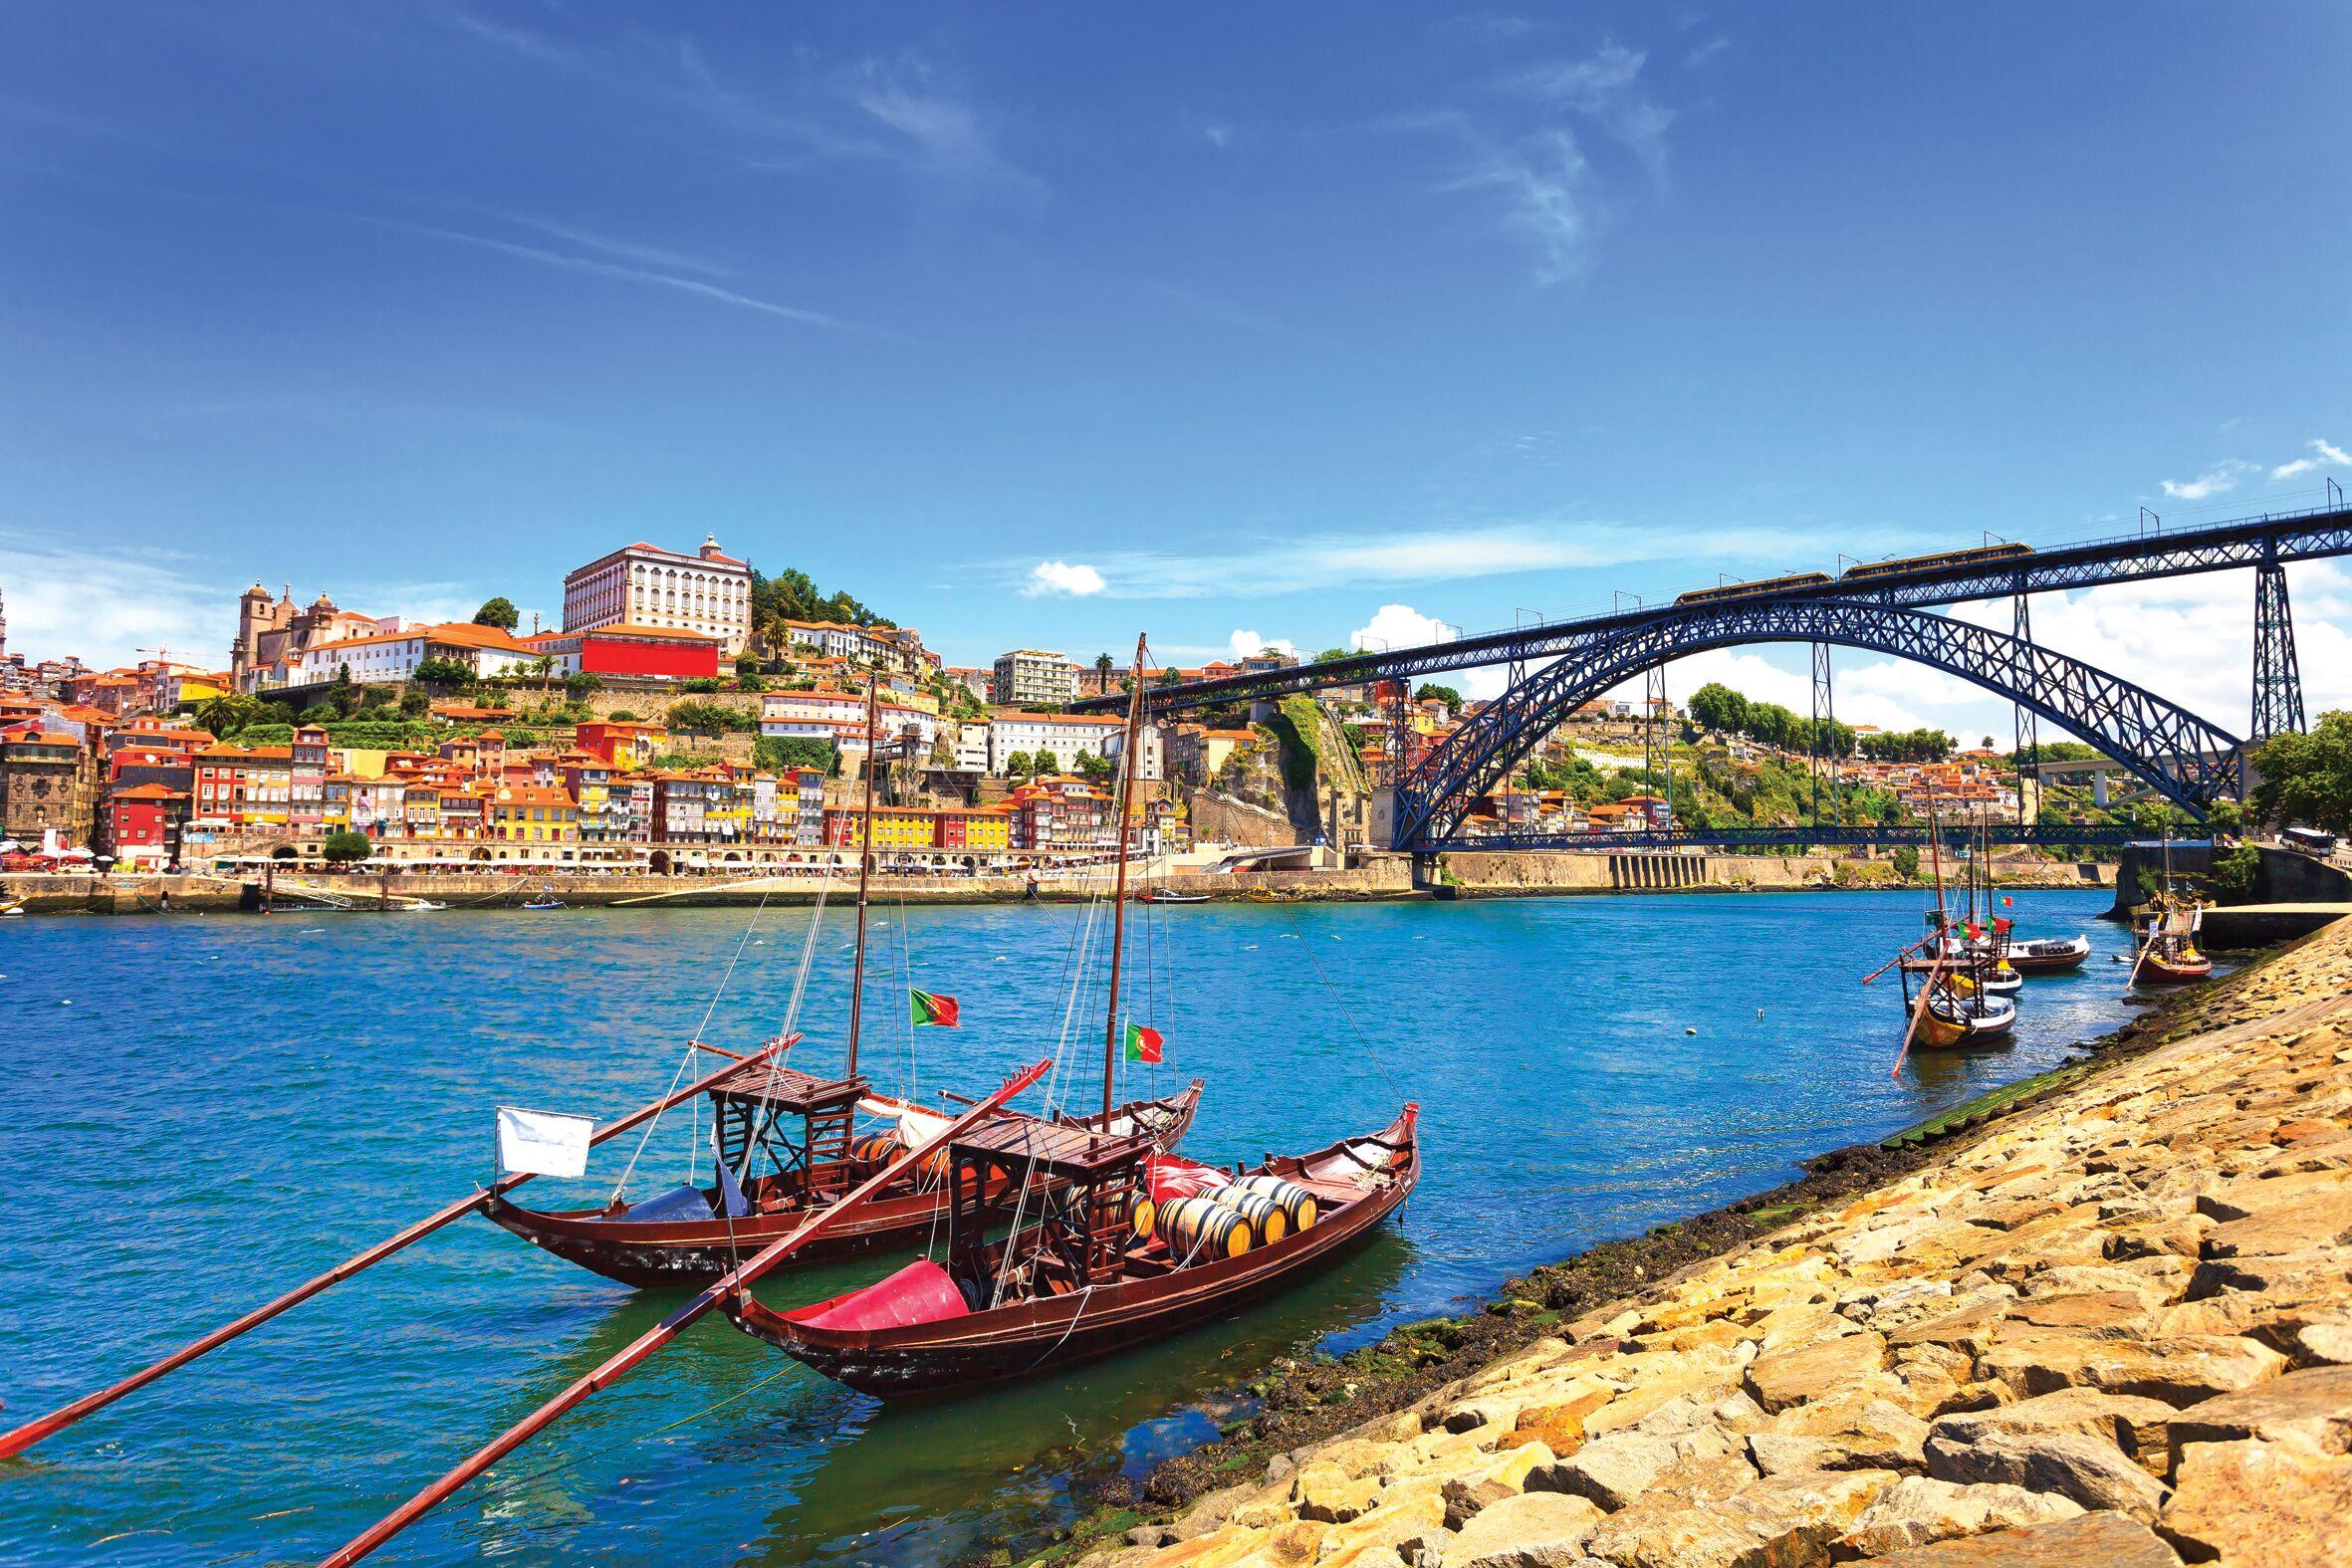 Evergreen Cruises & Tours releases full range of deluxe 2020